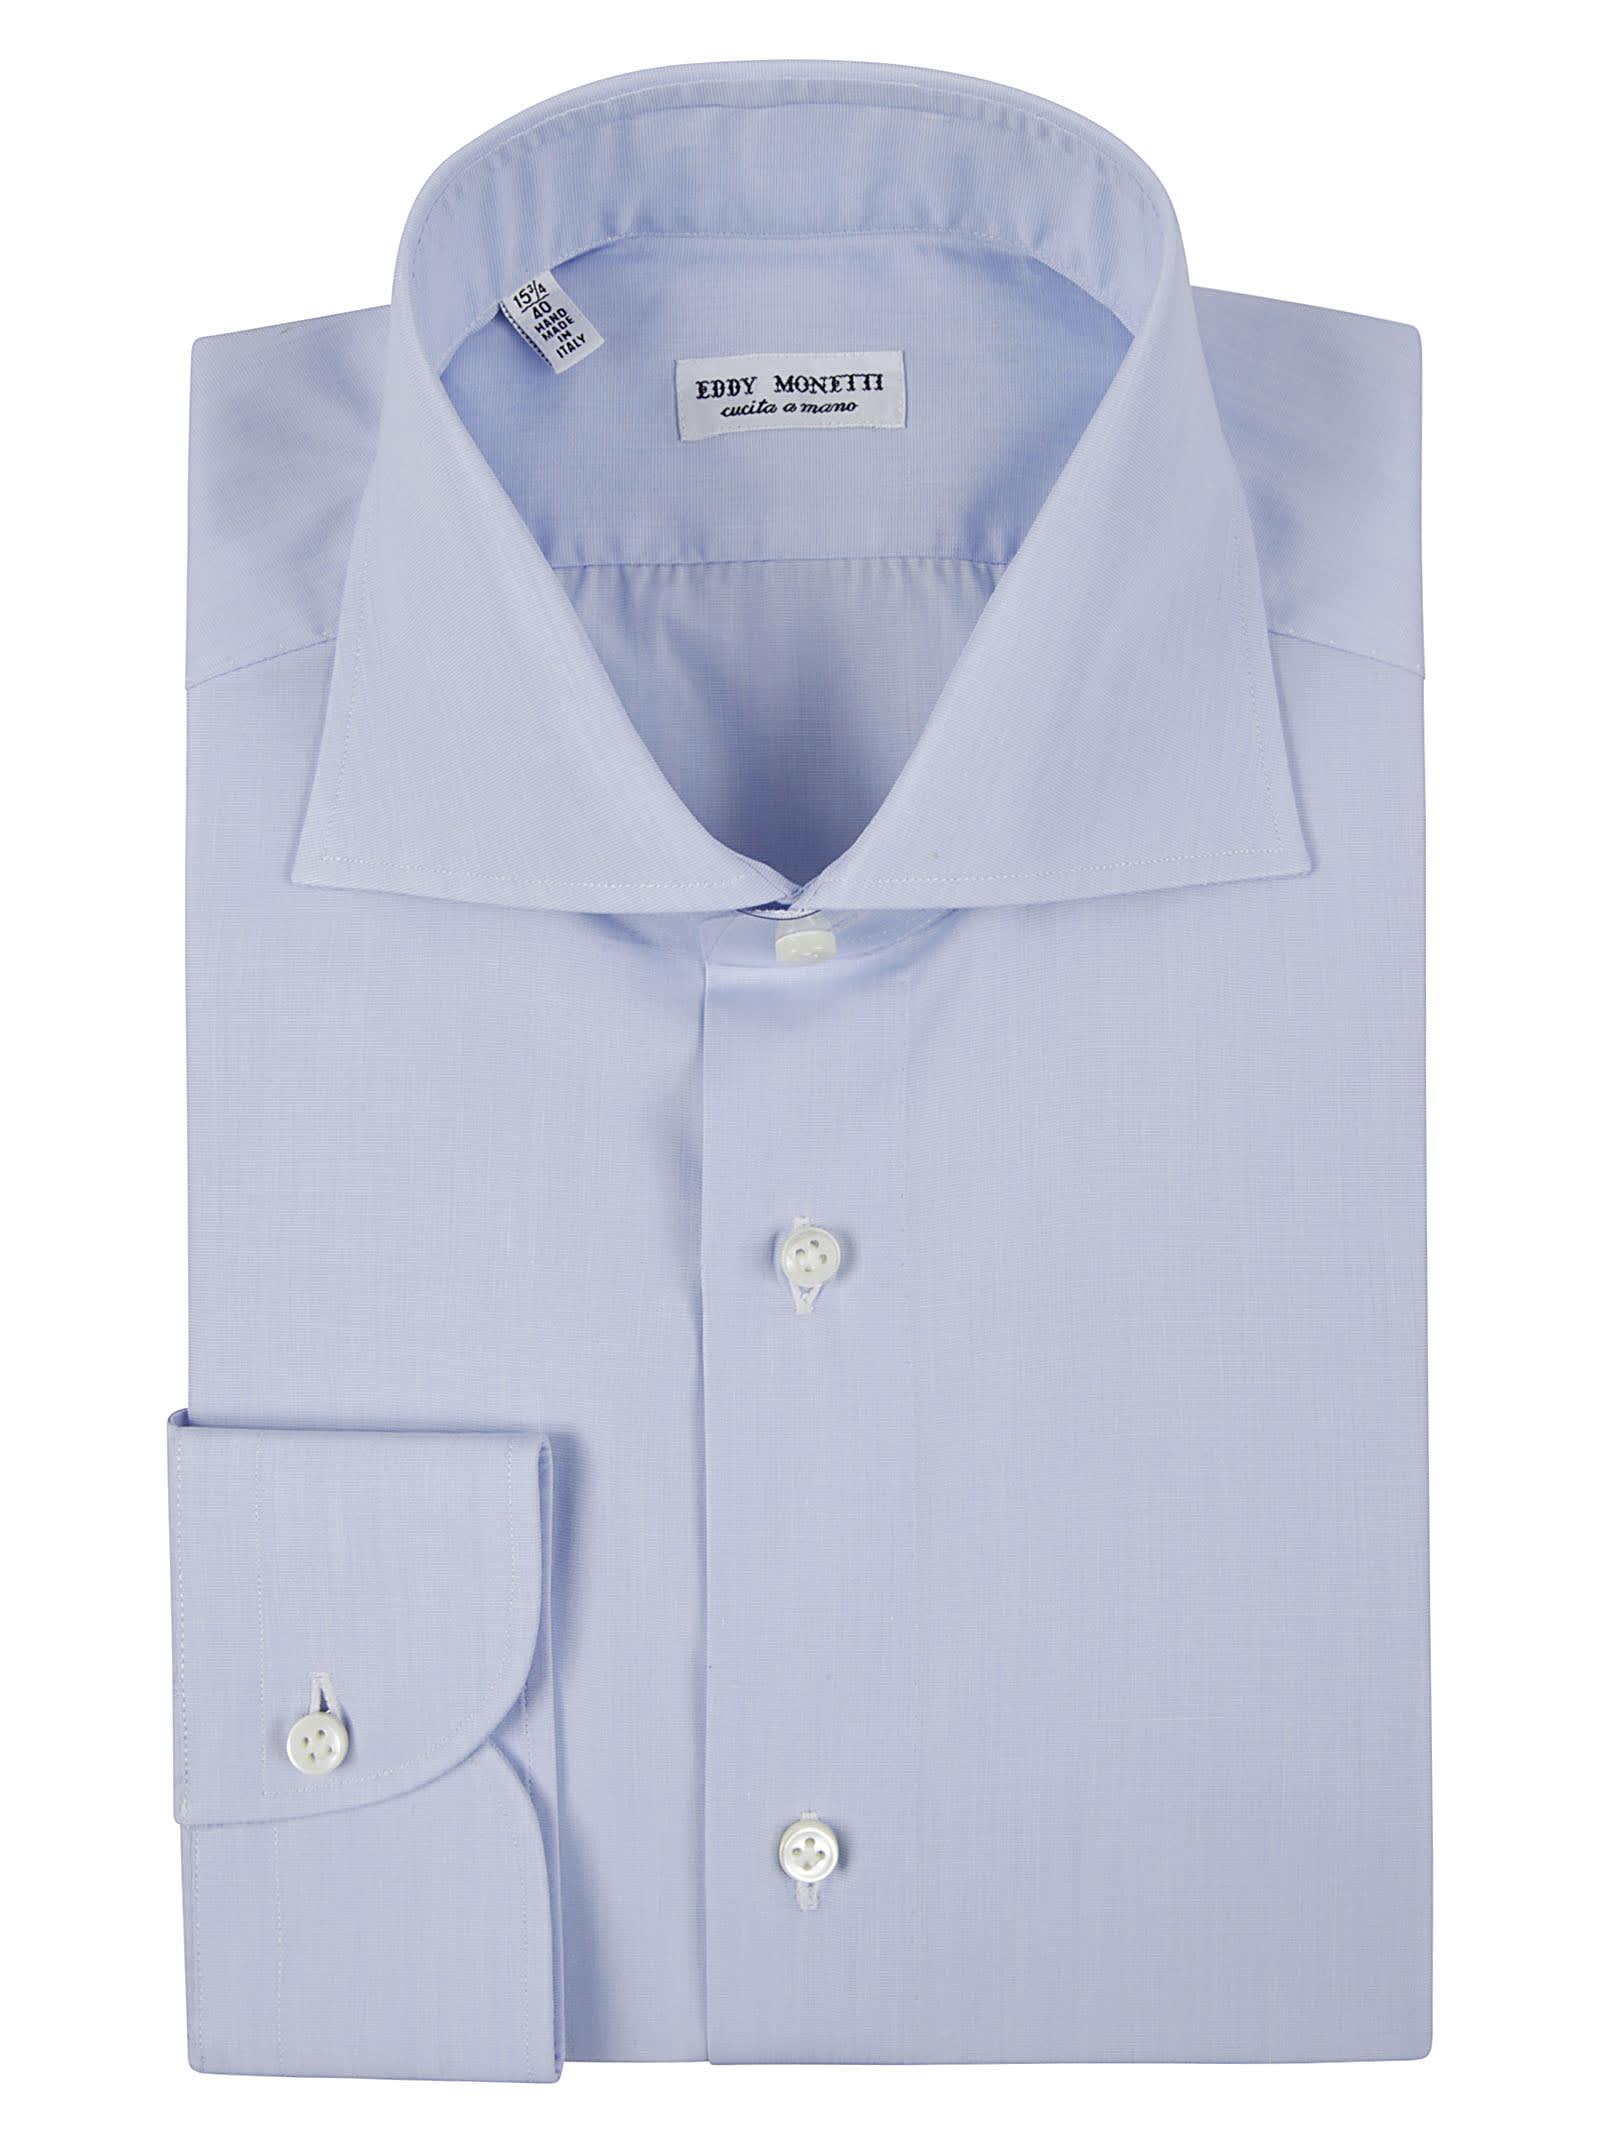 French Collar Shirt